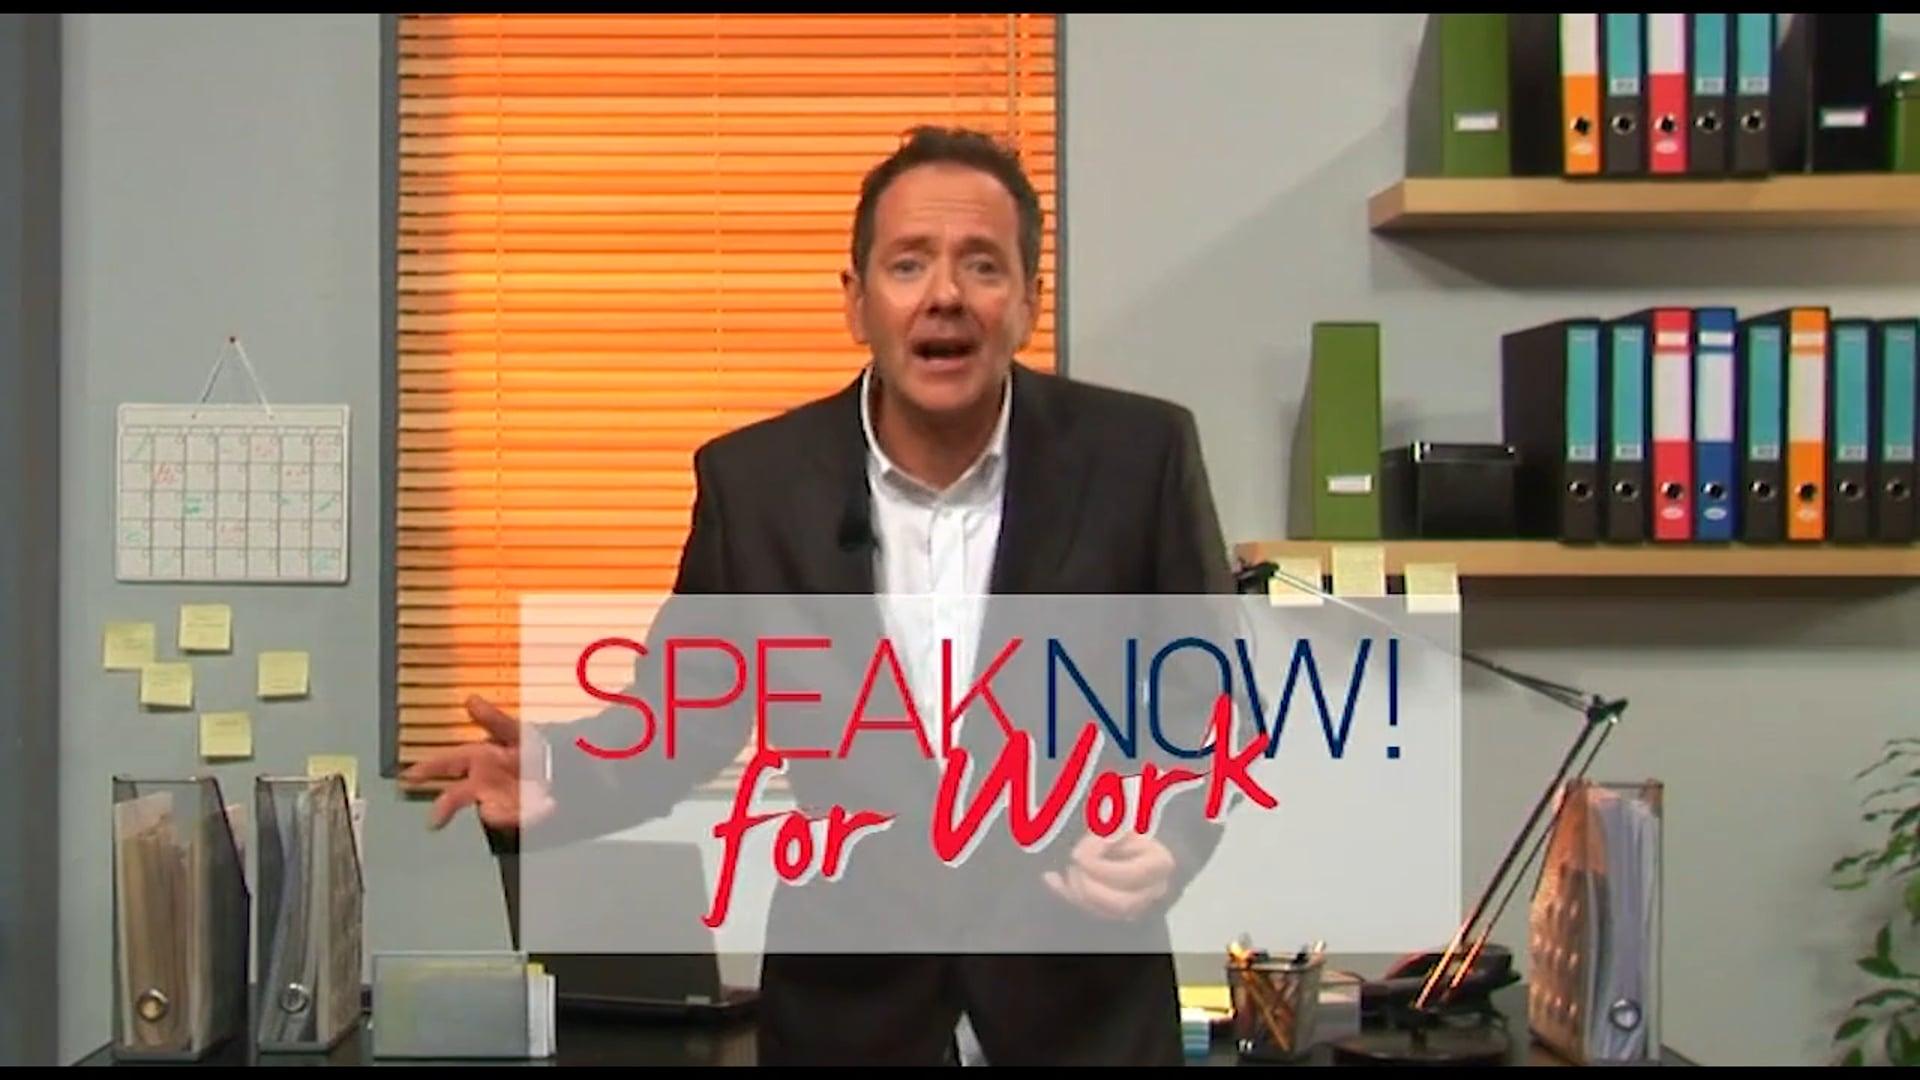 SPEAK NOW FOR WORK SIGLA